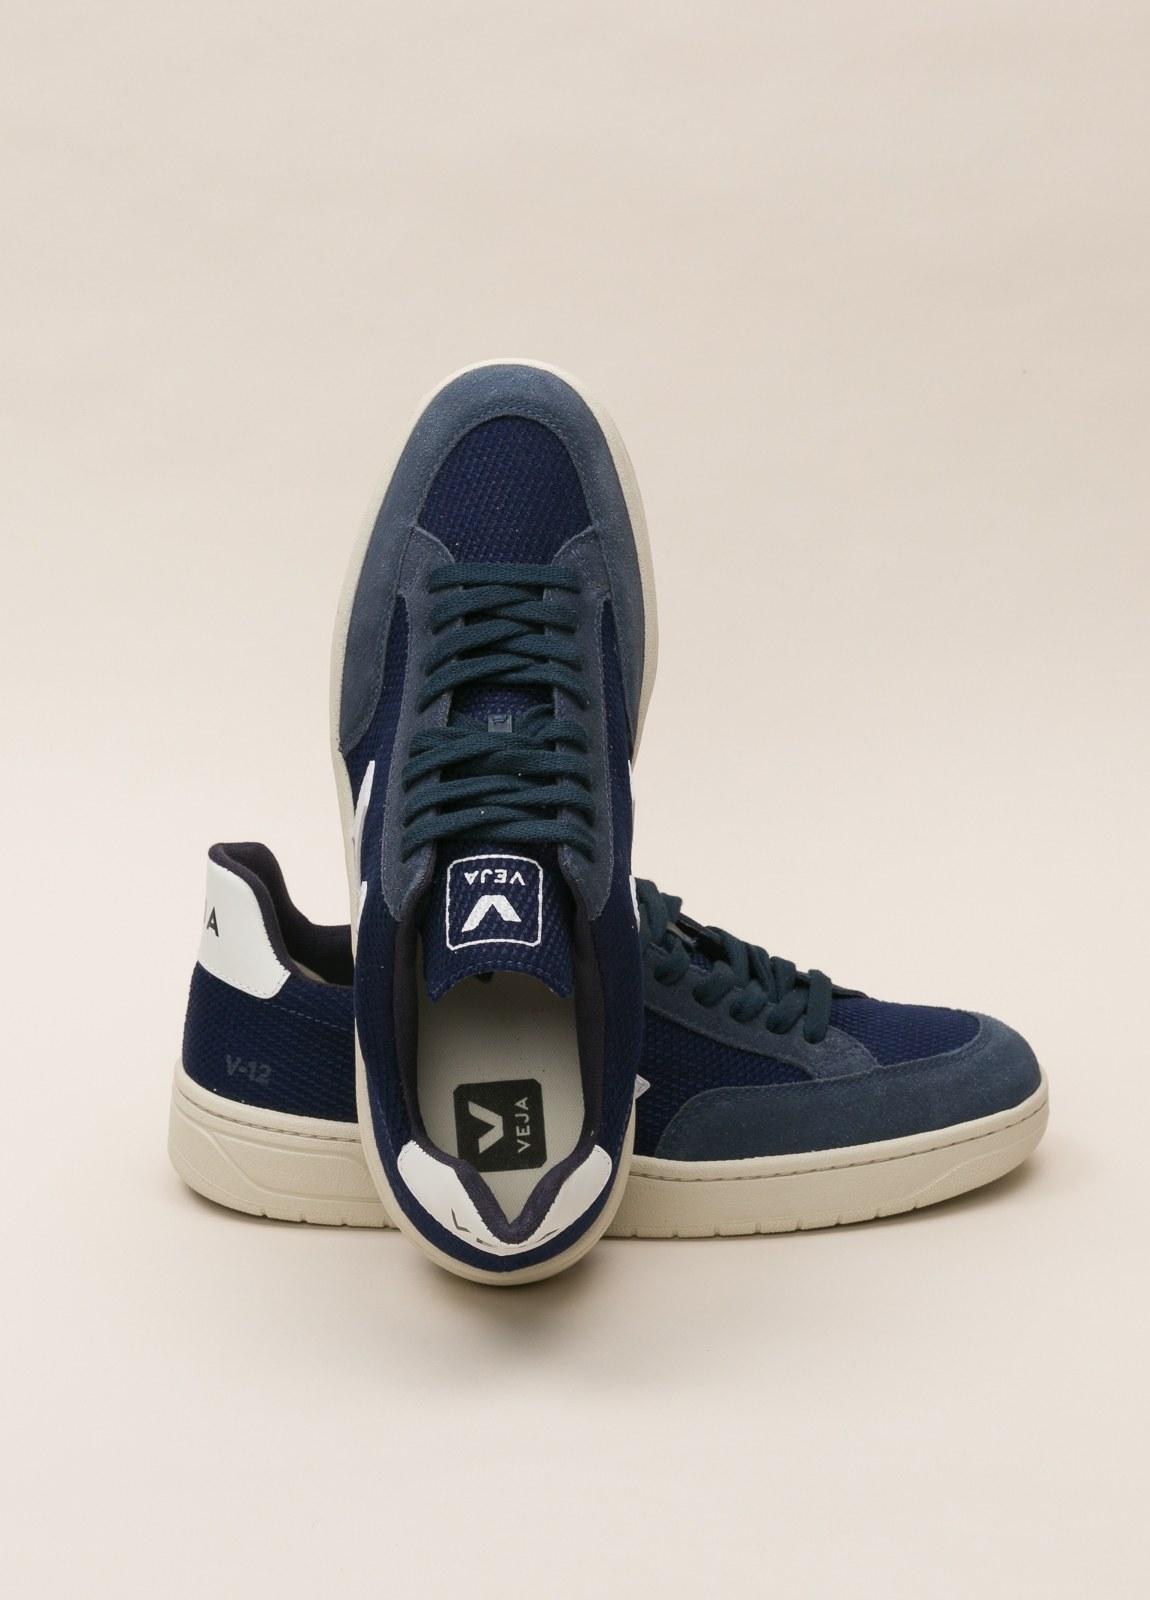 Zapatillas casual VEJA azul - Ítem1